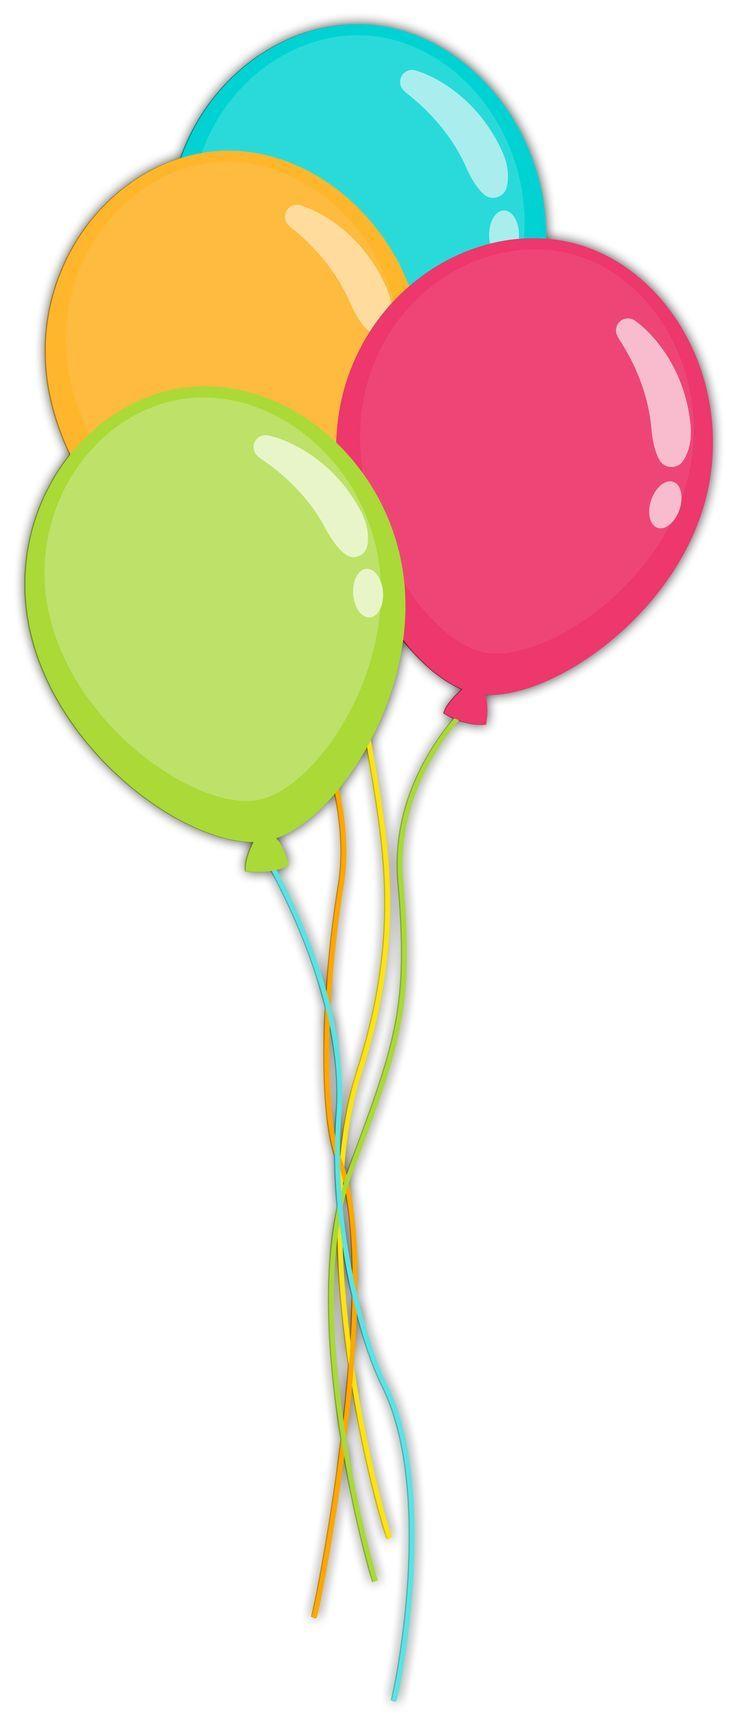 4 balloons clipart » Clipart Portal.